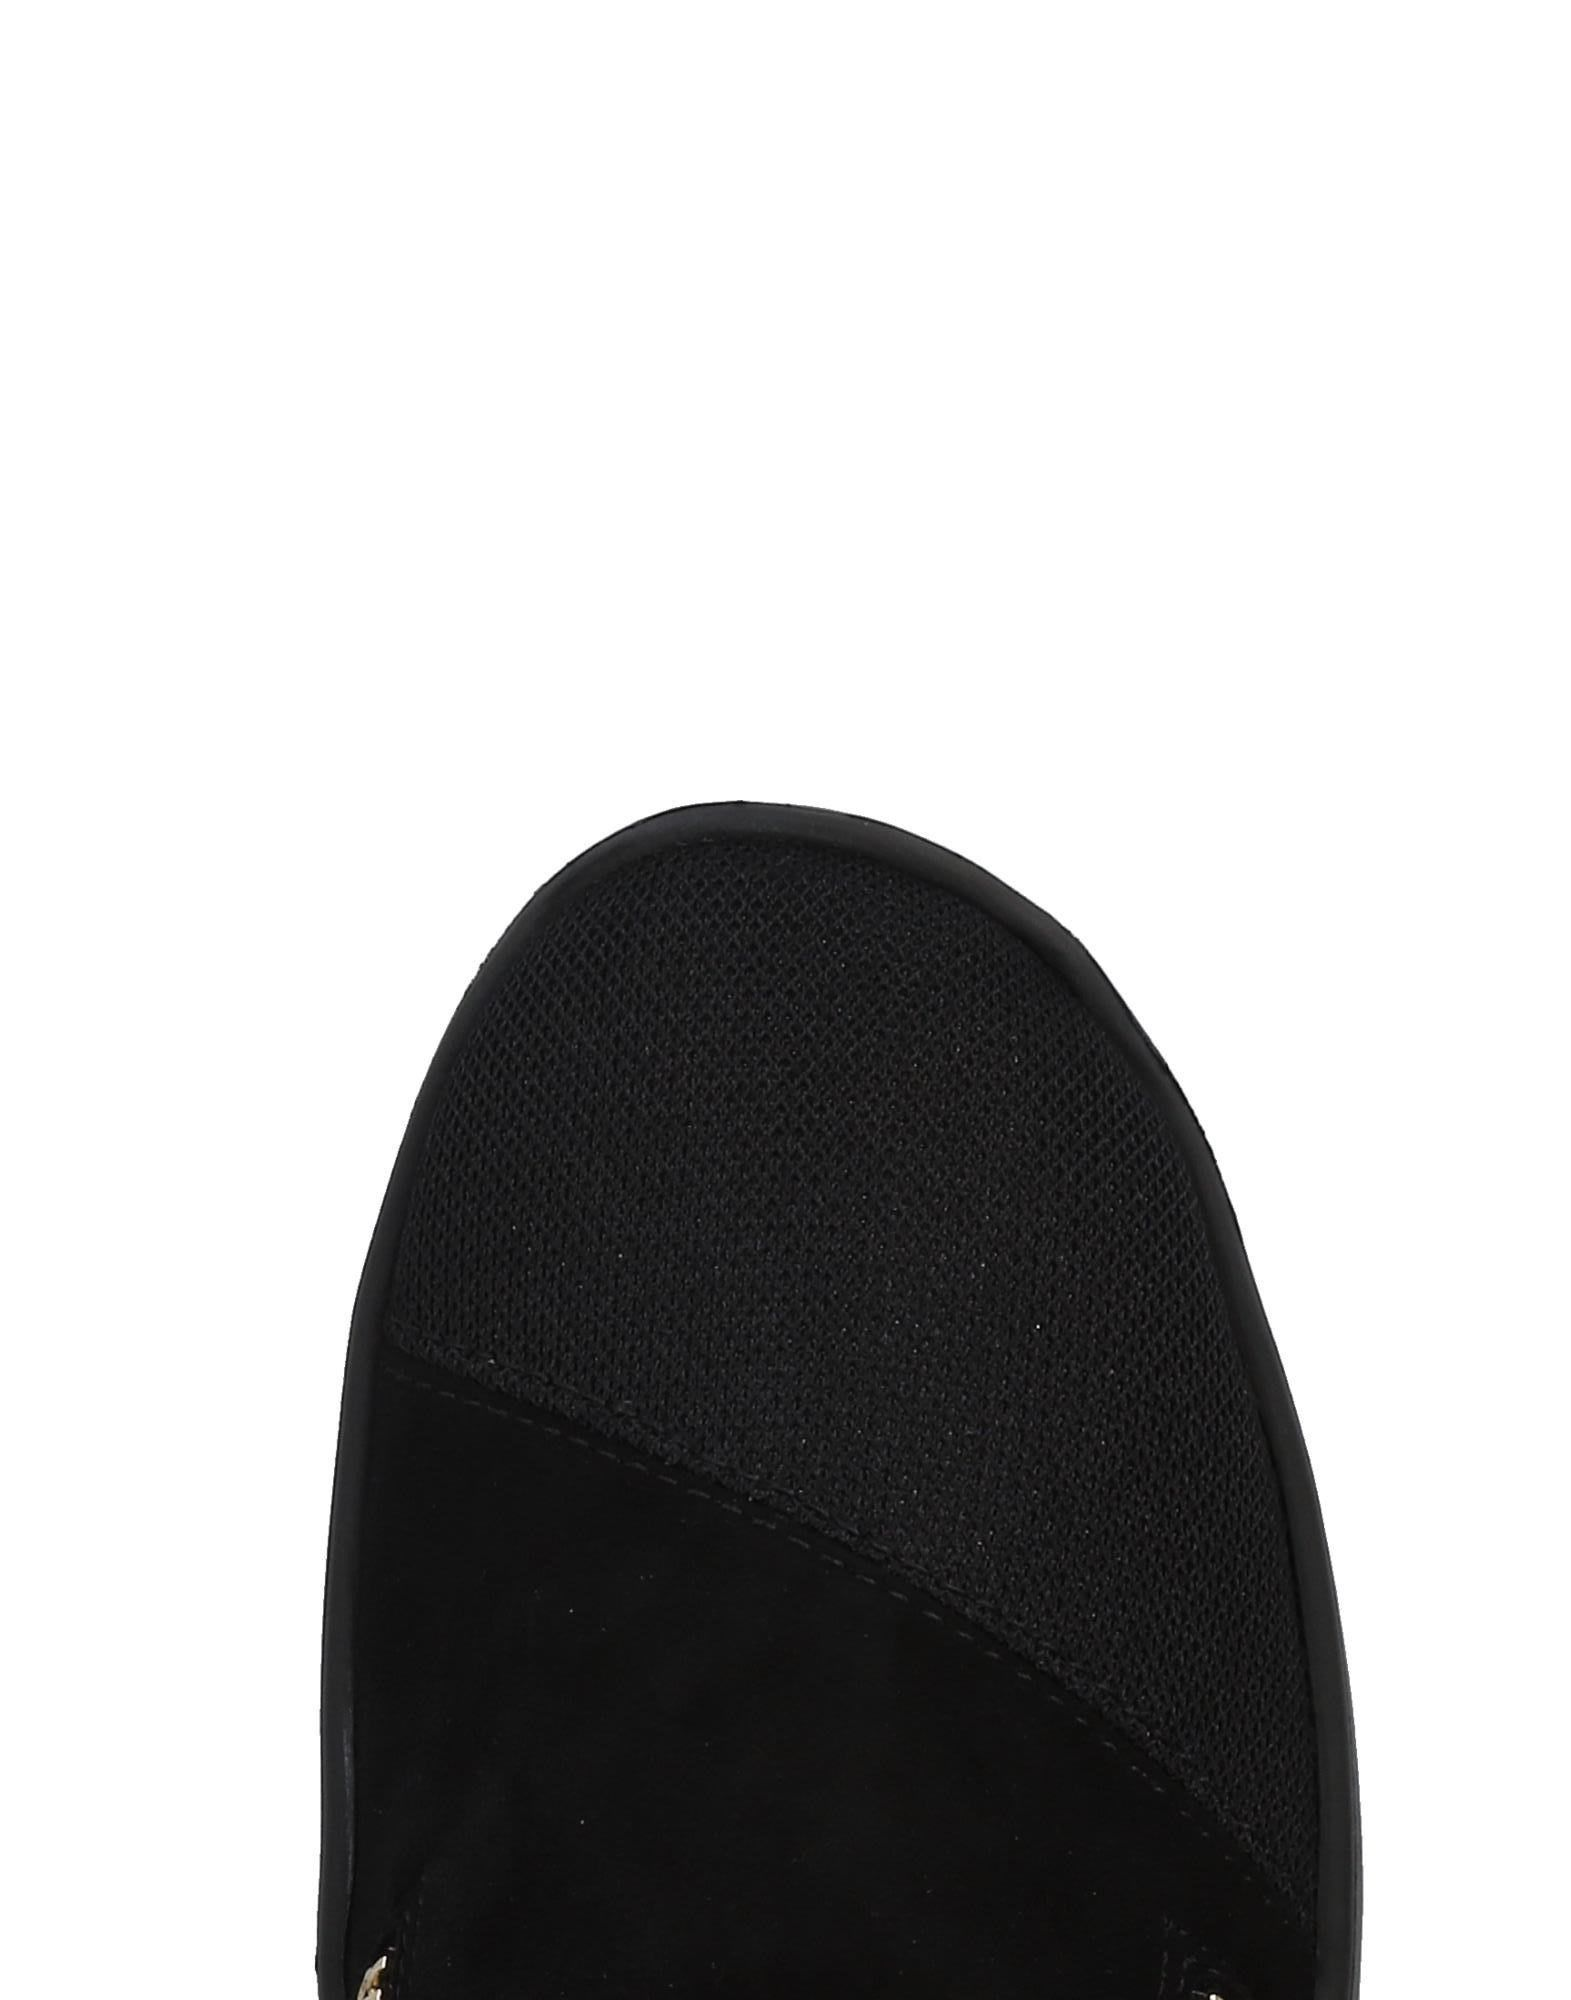 Giuseppe Zanotti Gute Sneakers Herren  11446911DR Gute Zanotti Qualität beliebte Schuhe 7e4739